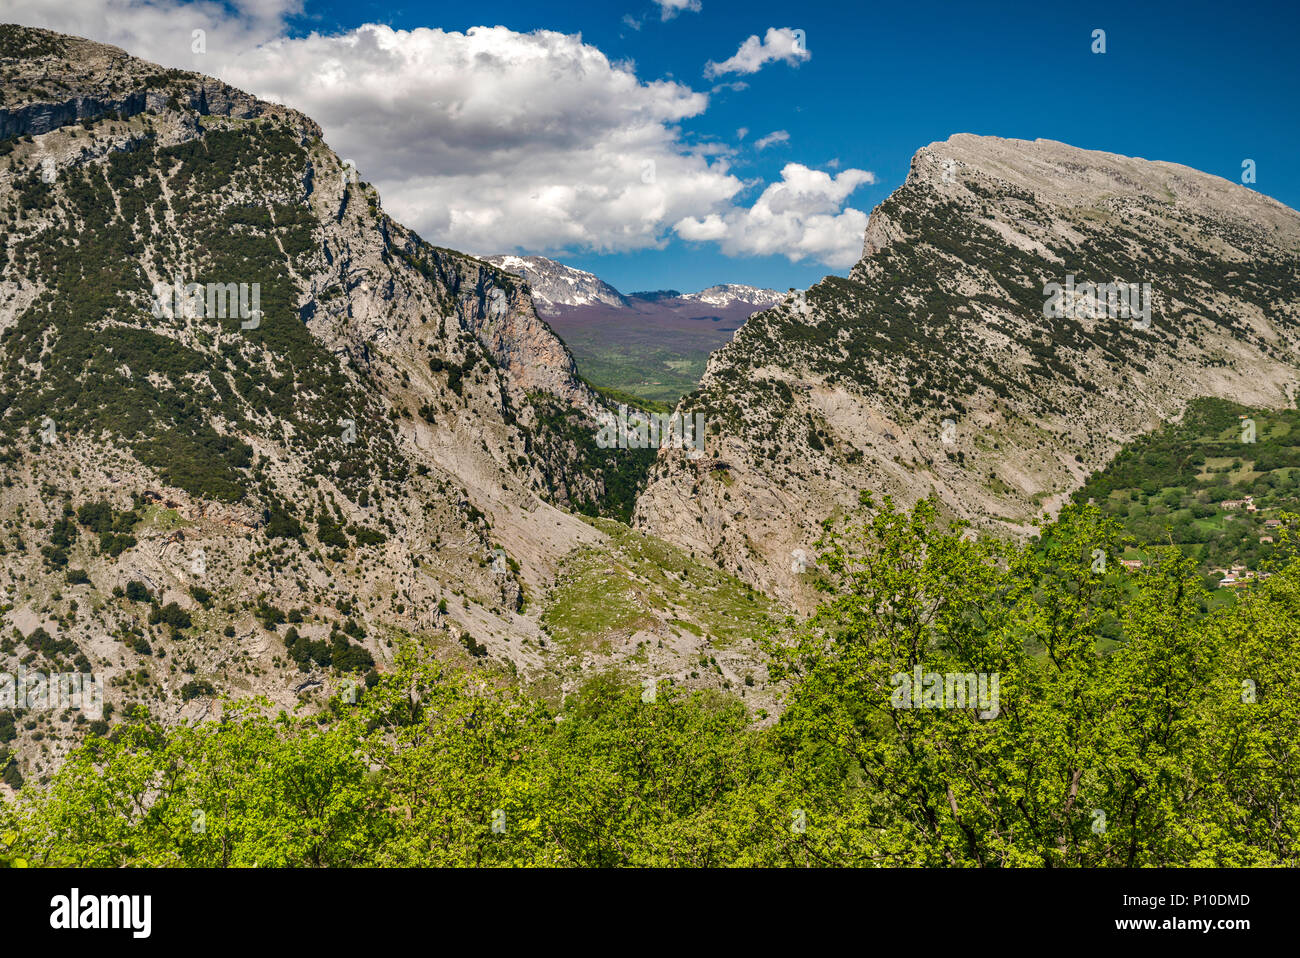 Gole del Raganello Raganello (Canyon), vue de San Lorenzo Bellizzi, le sud de l'Apennin, le parc national du Pollino, Calabre, Italie Photo Stock